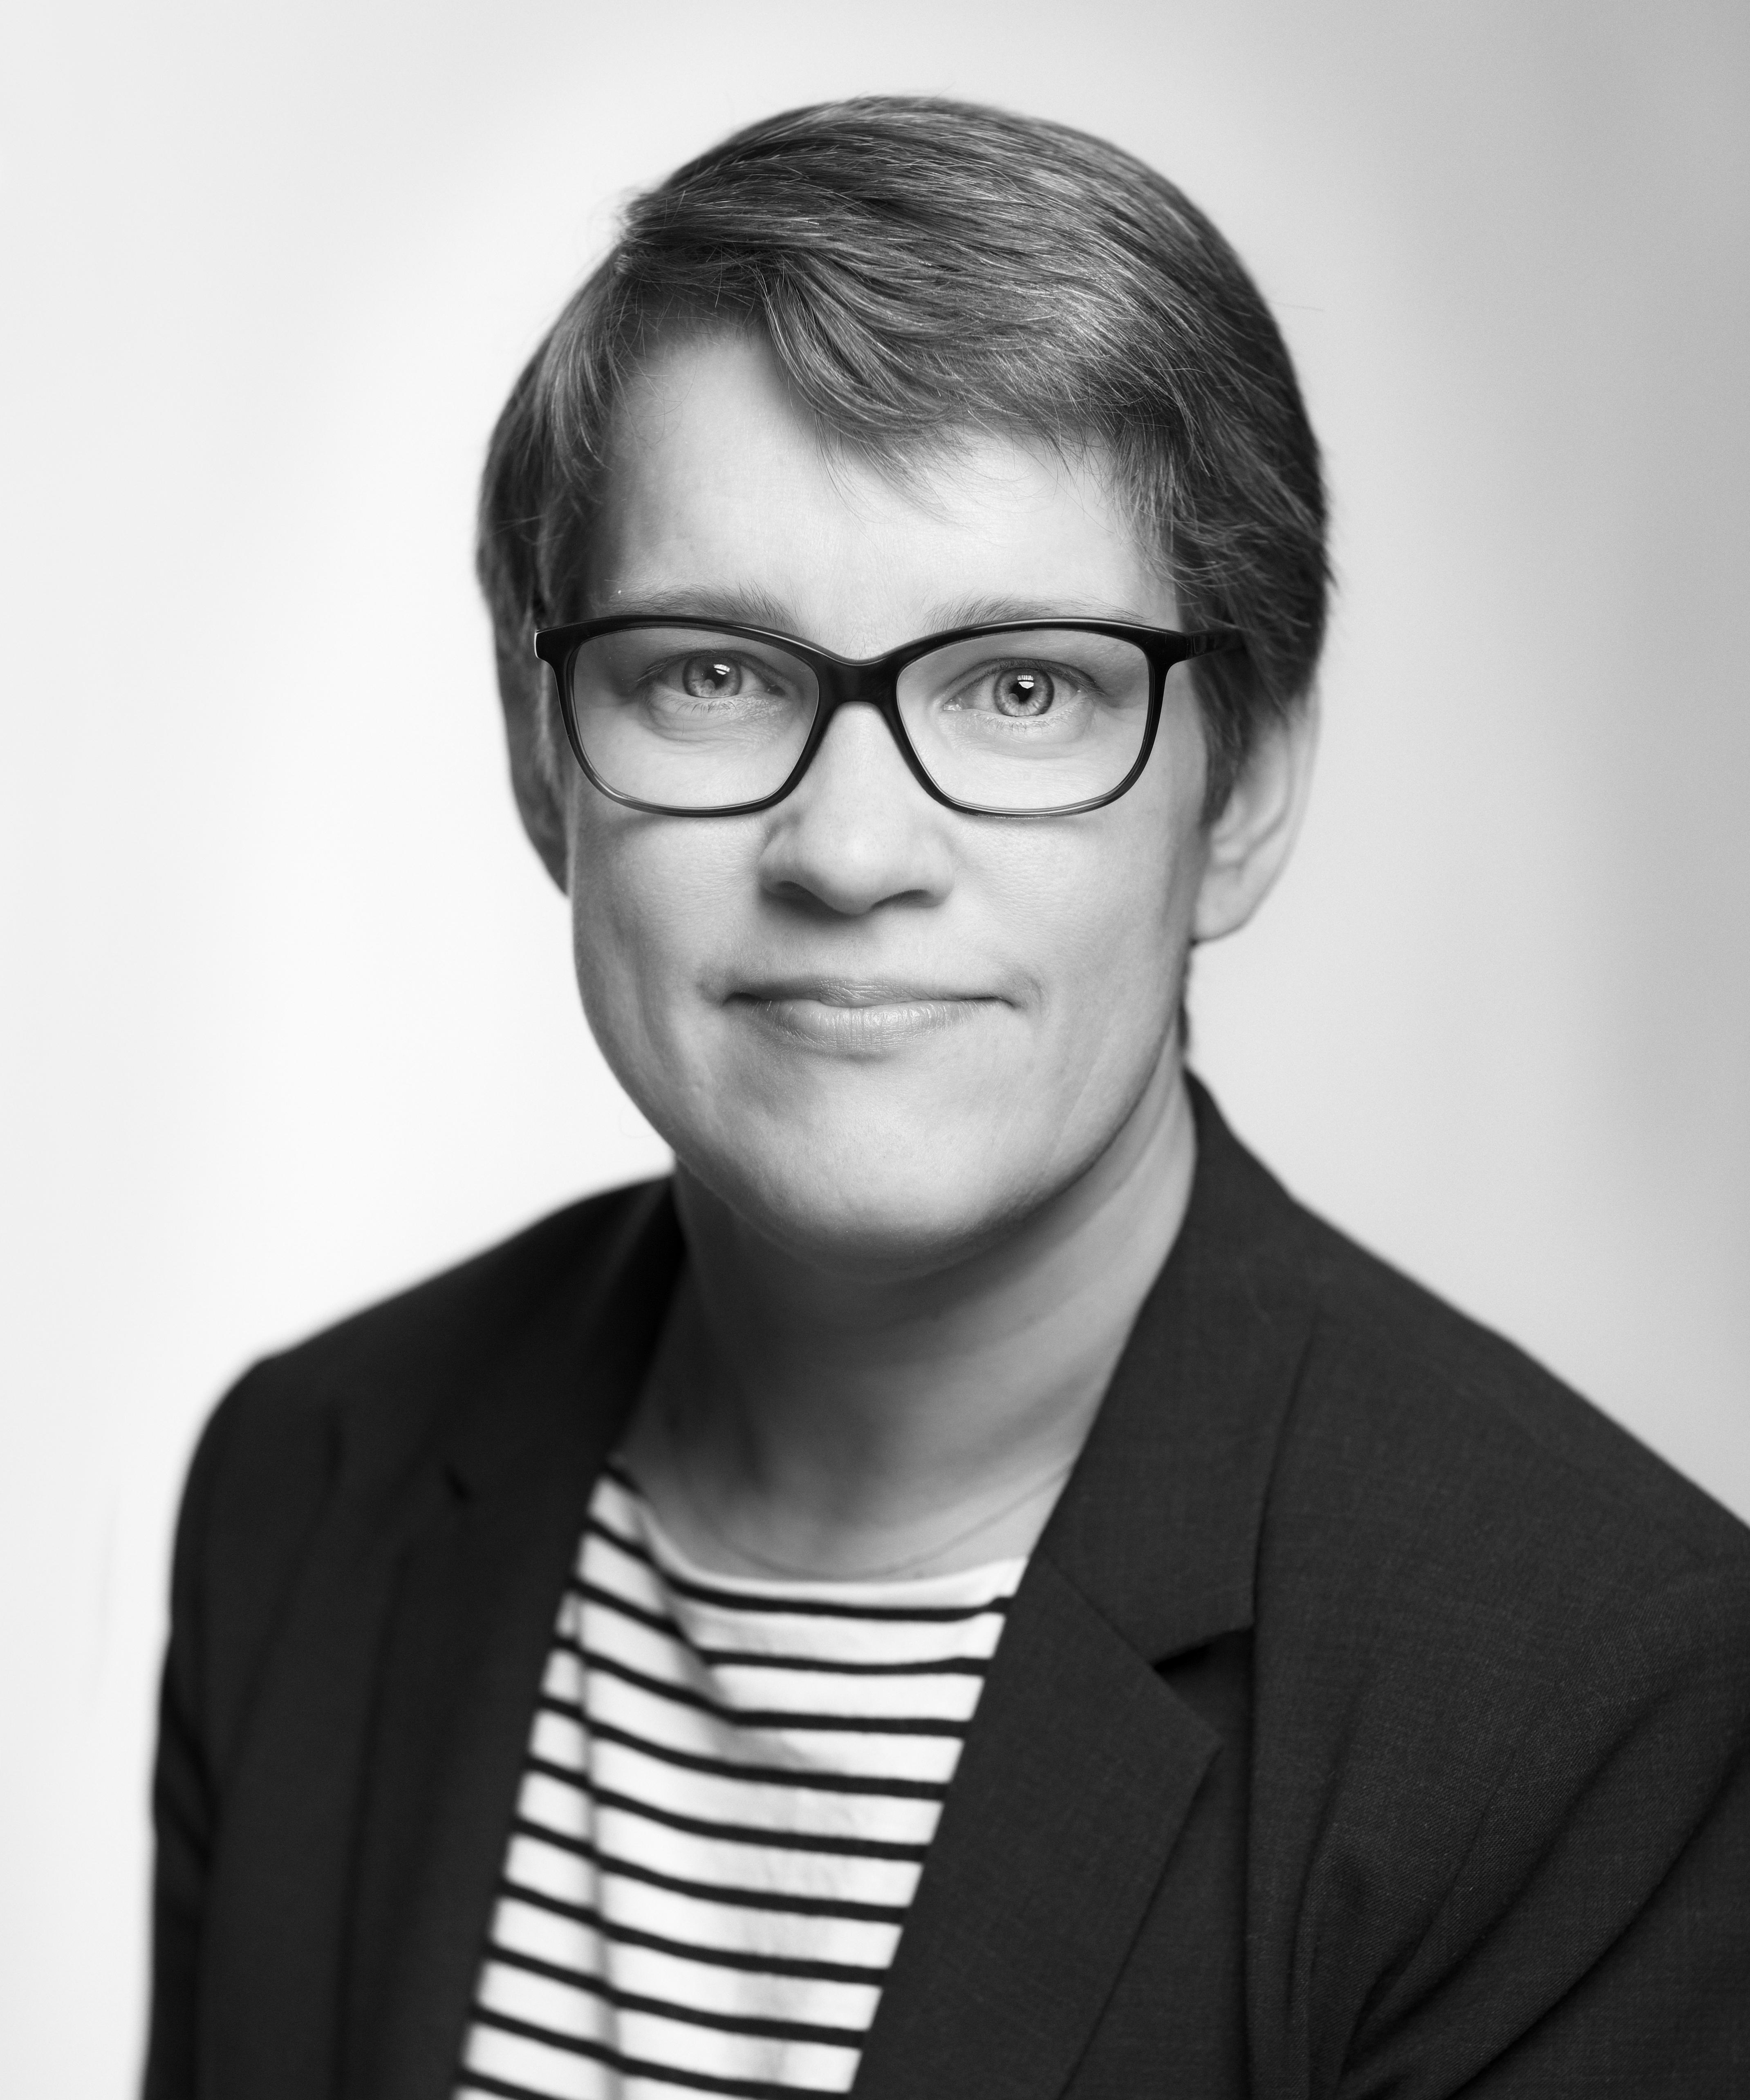 Erika Wermeling